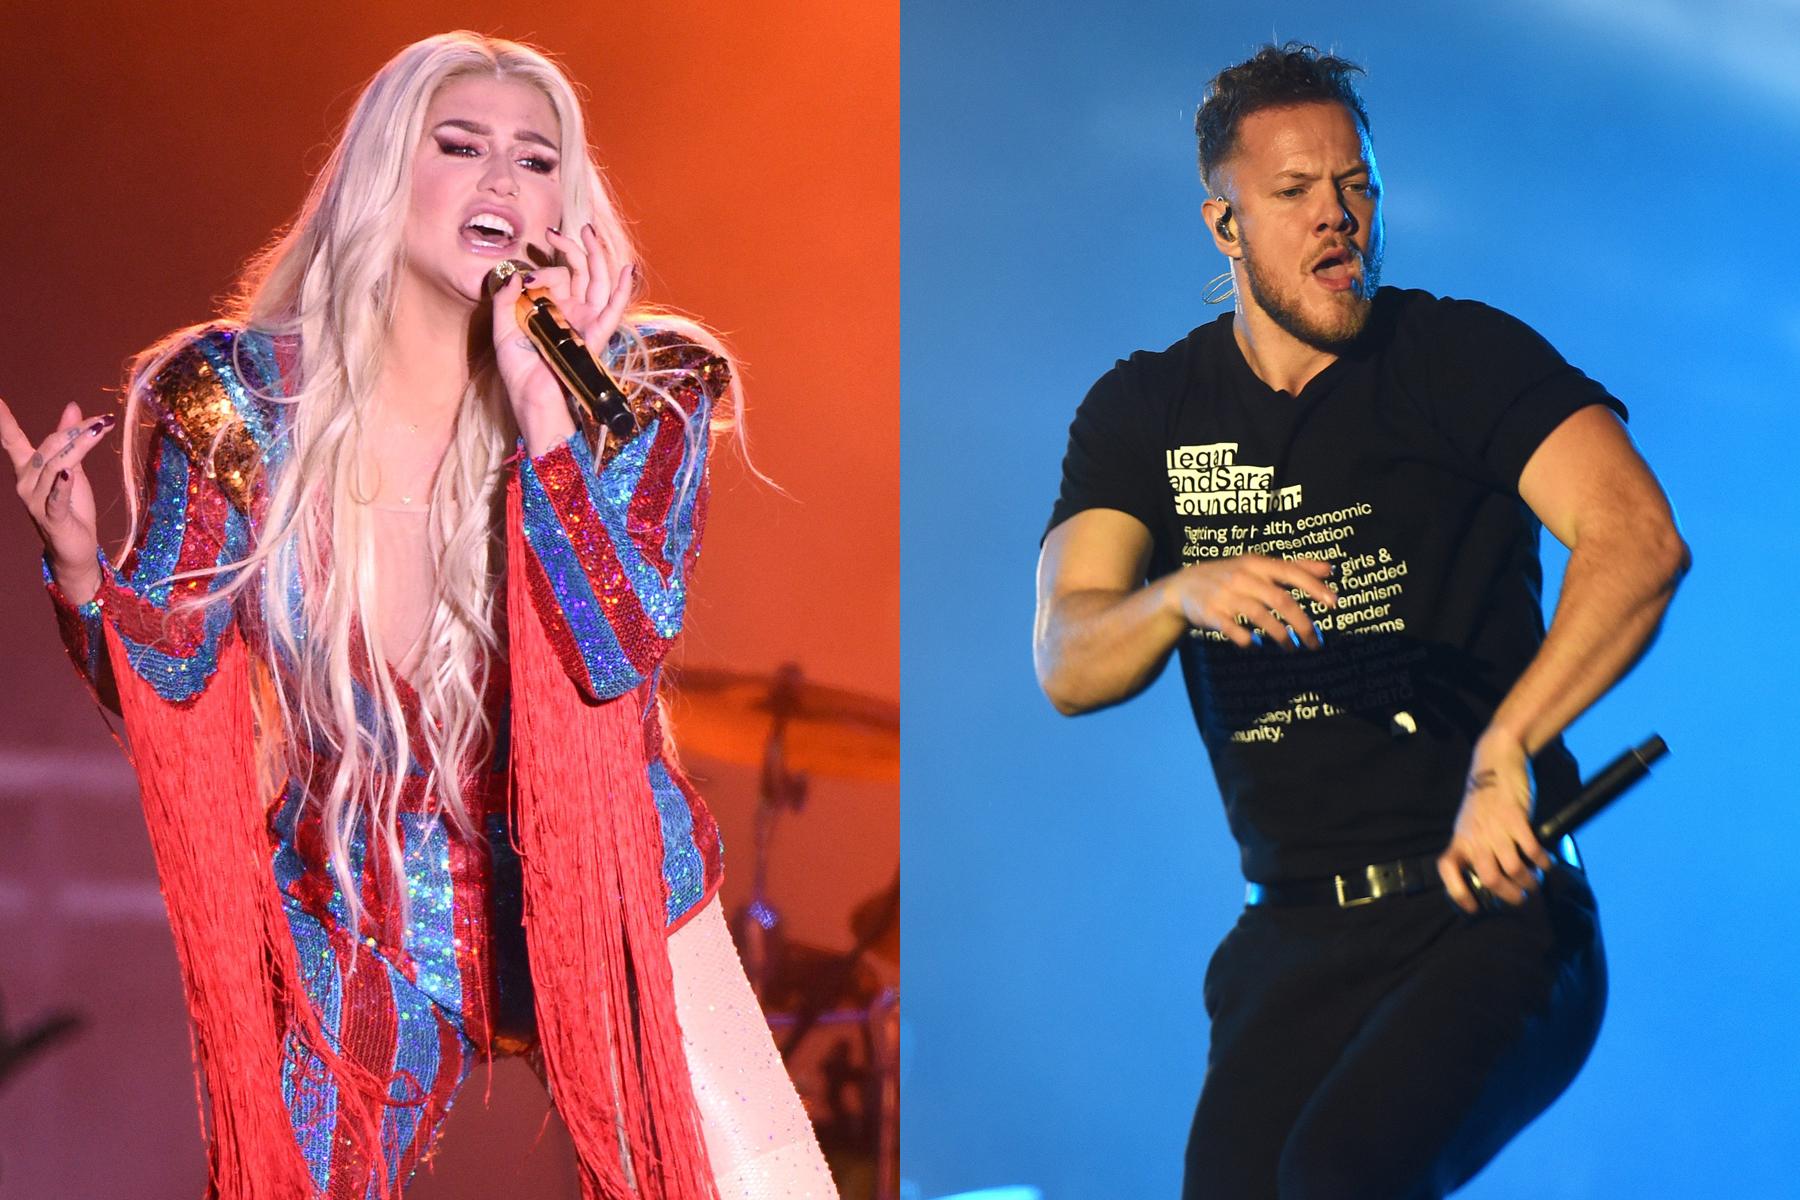 Imagine Dragons' Dan Reynolds Taps Kesha to Headline LoveLoud Festival